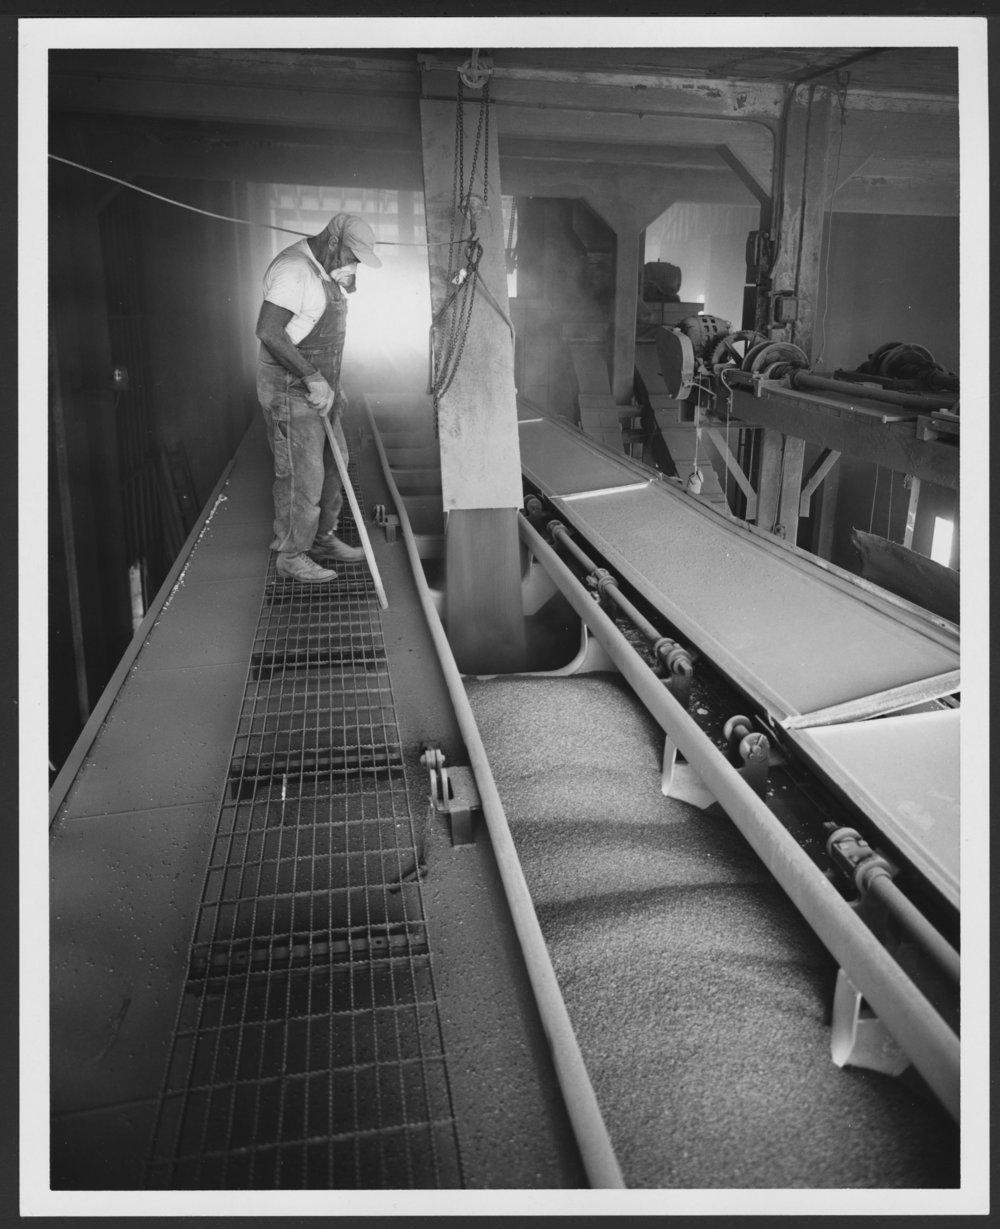 Atchison, Topeka & Santa Fe Railway Company hopper cars - 1